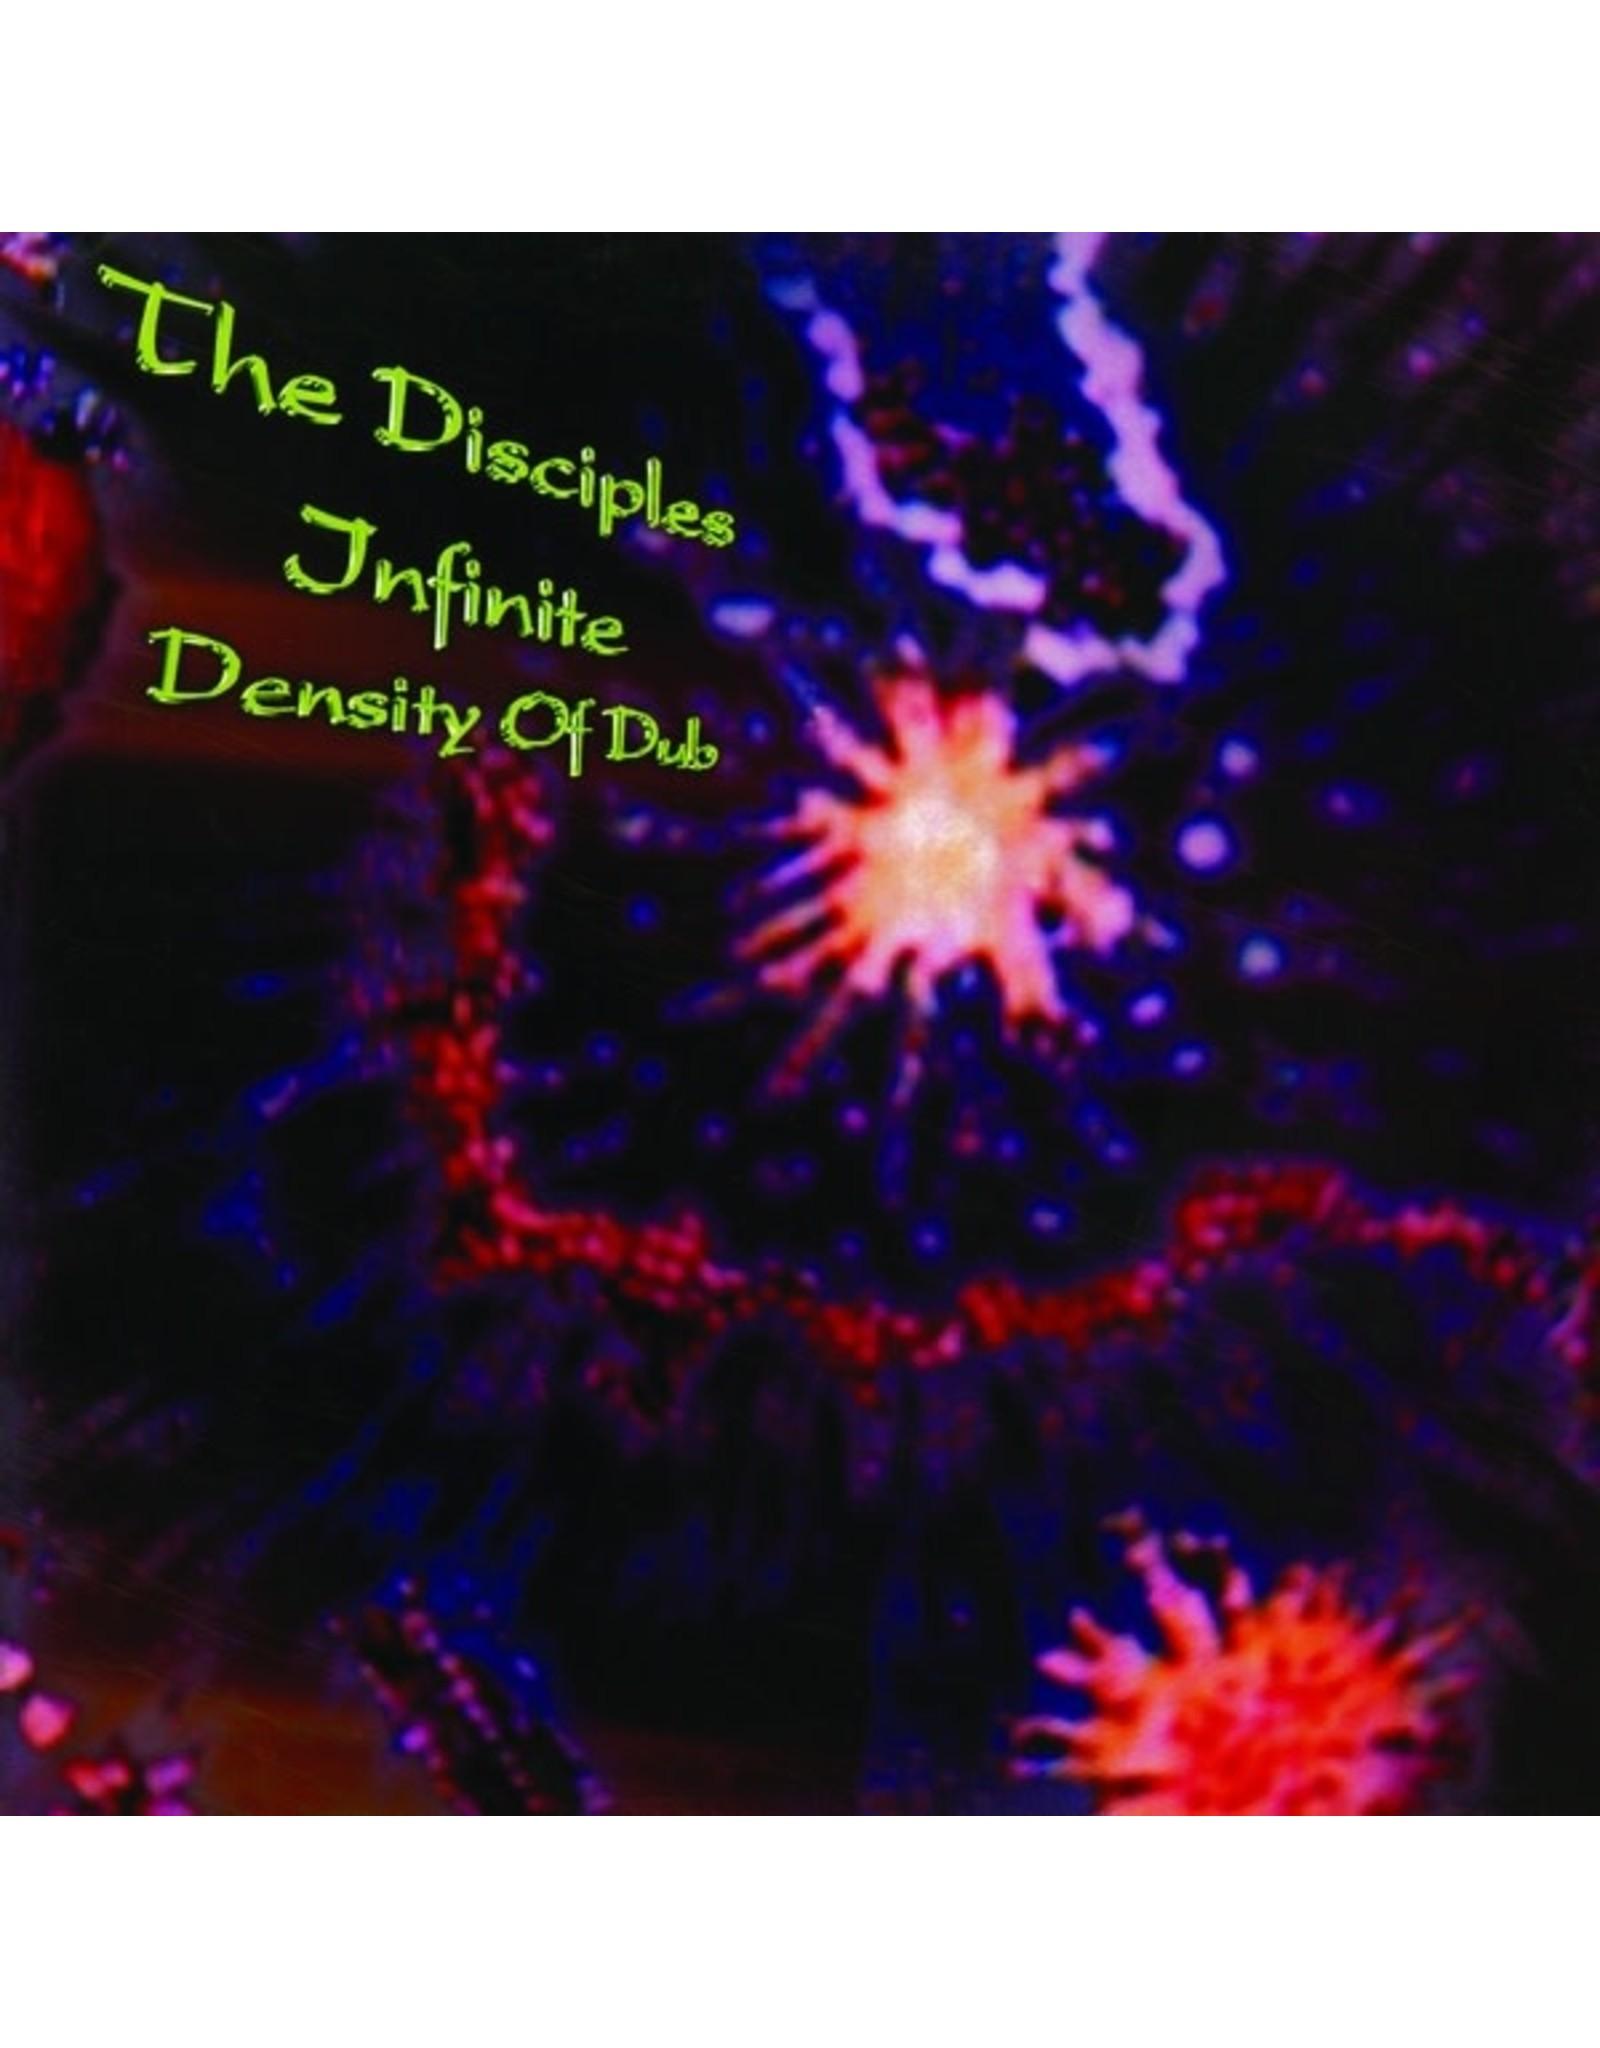 New Vinyl The Disciples - Infinite Density of Dub LP